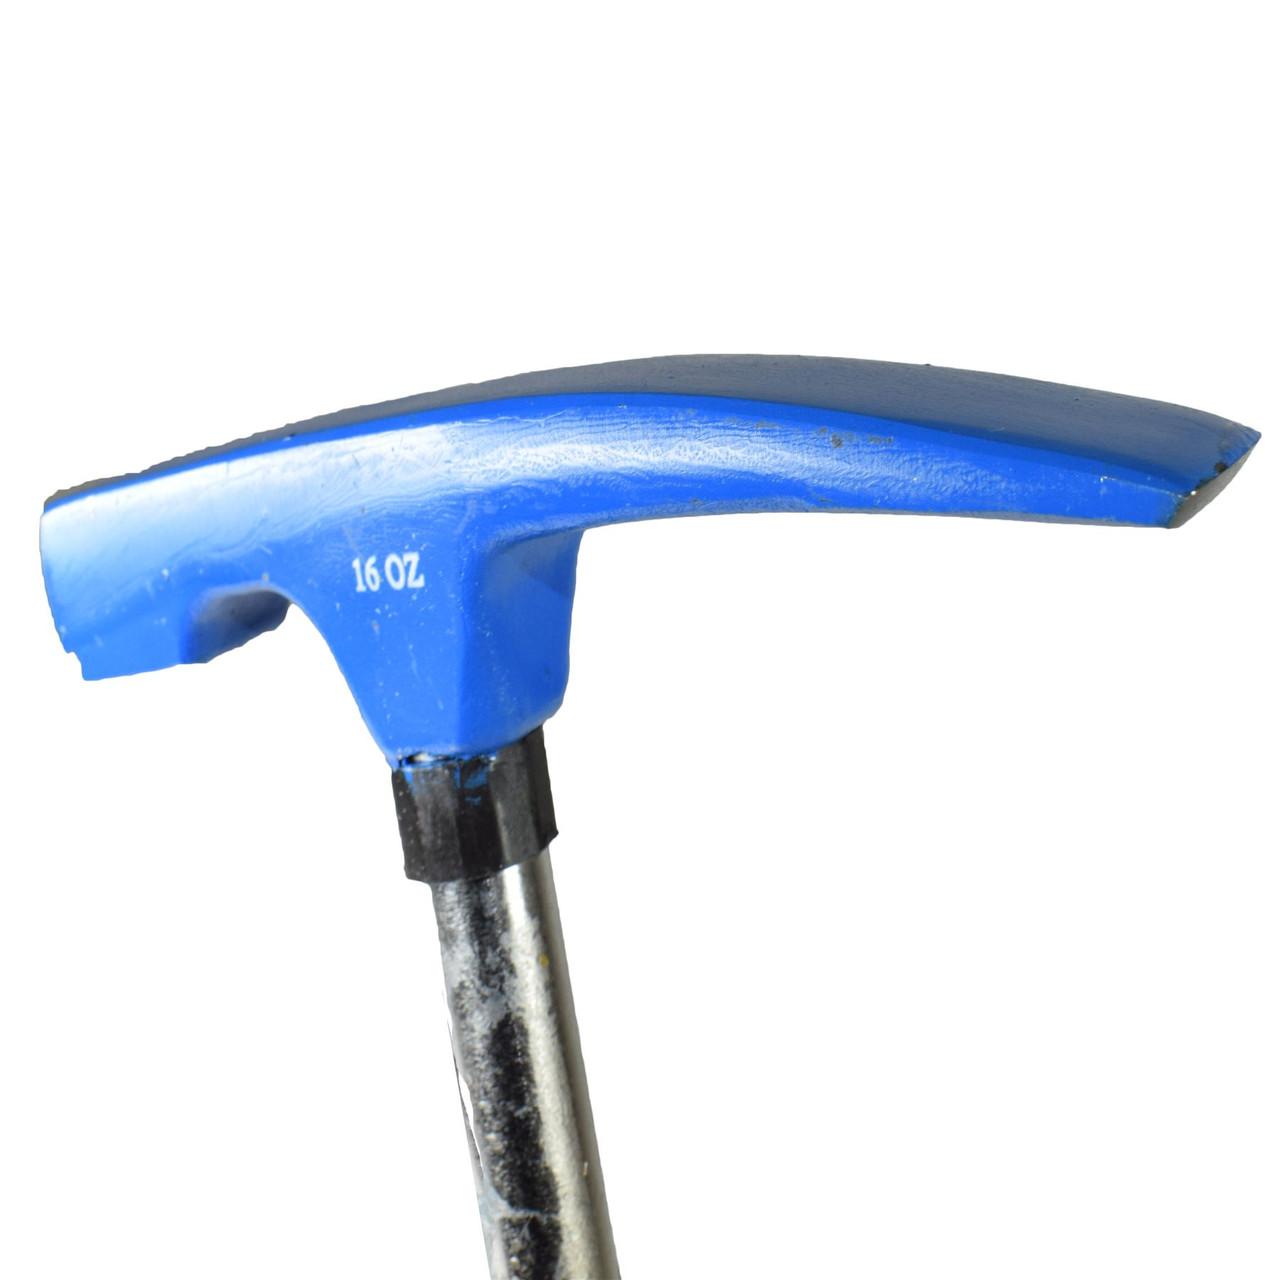 600g All Steel Brick Hammer Brick Layer Laying Chipping Masonry U S Pro Tools